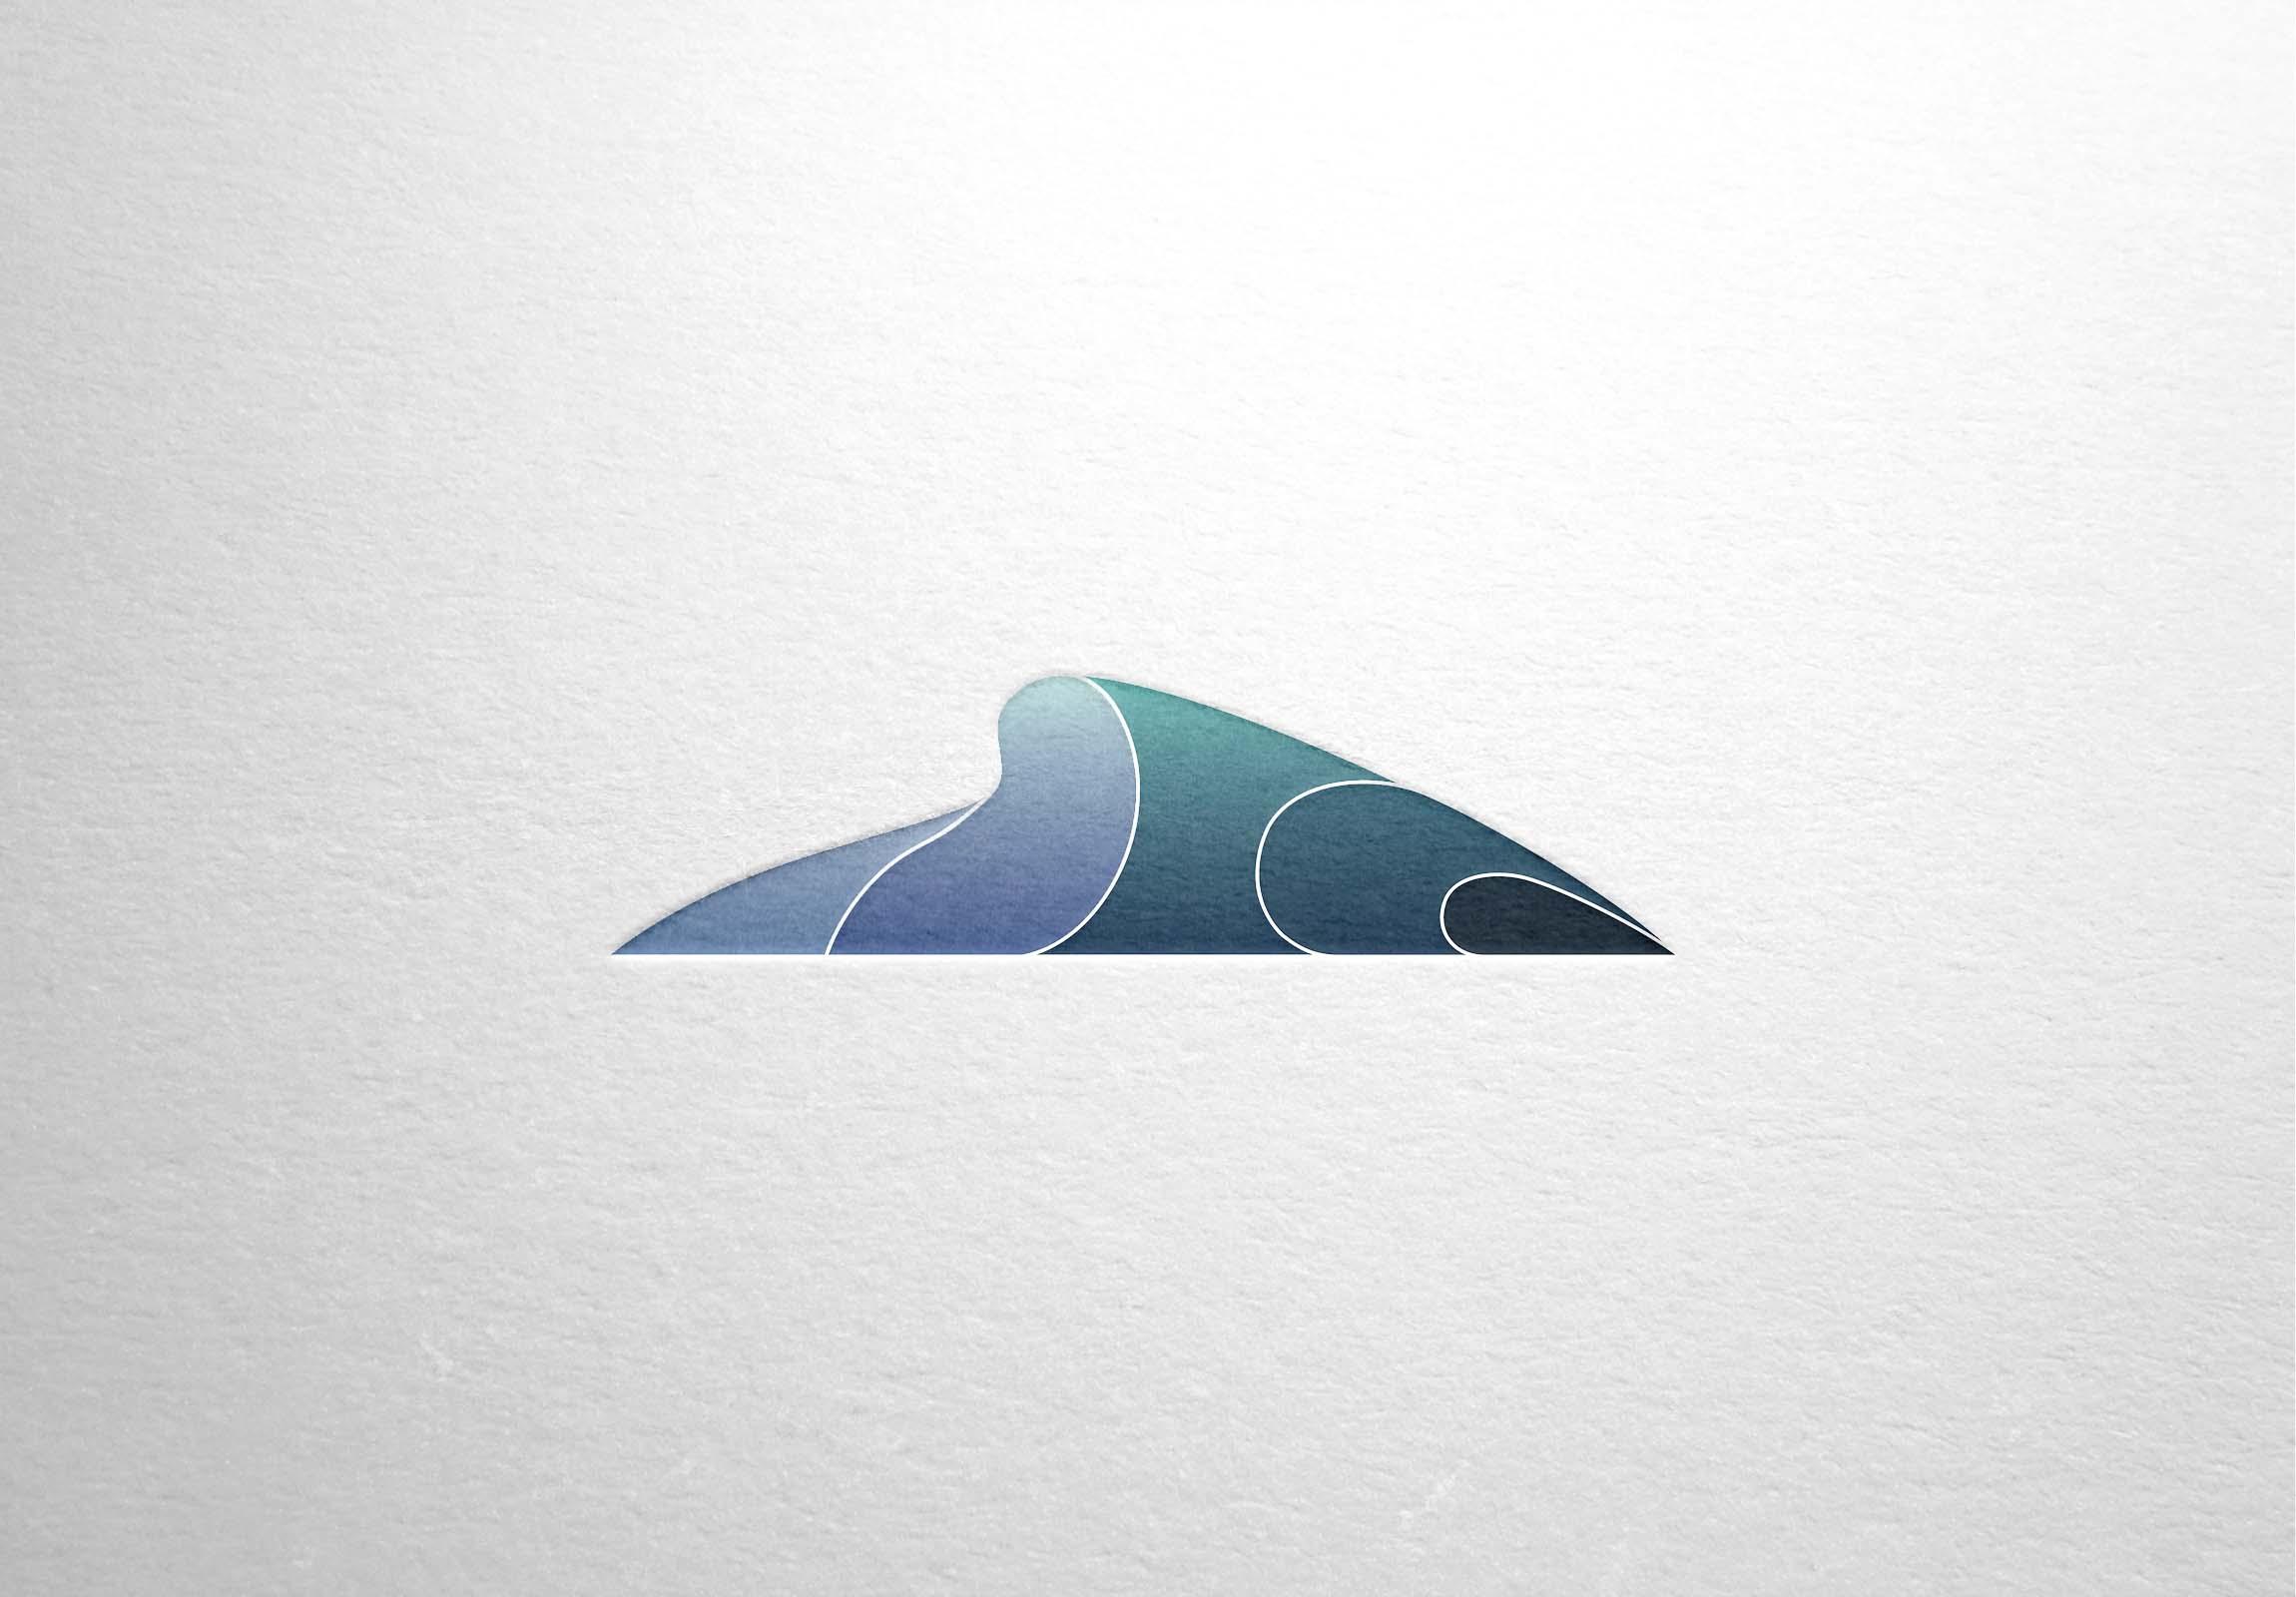 Разработка логотипа для компании «Русские Био Ресурсы» фото f_81158f8af174a26e.jpg